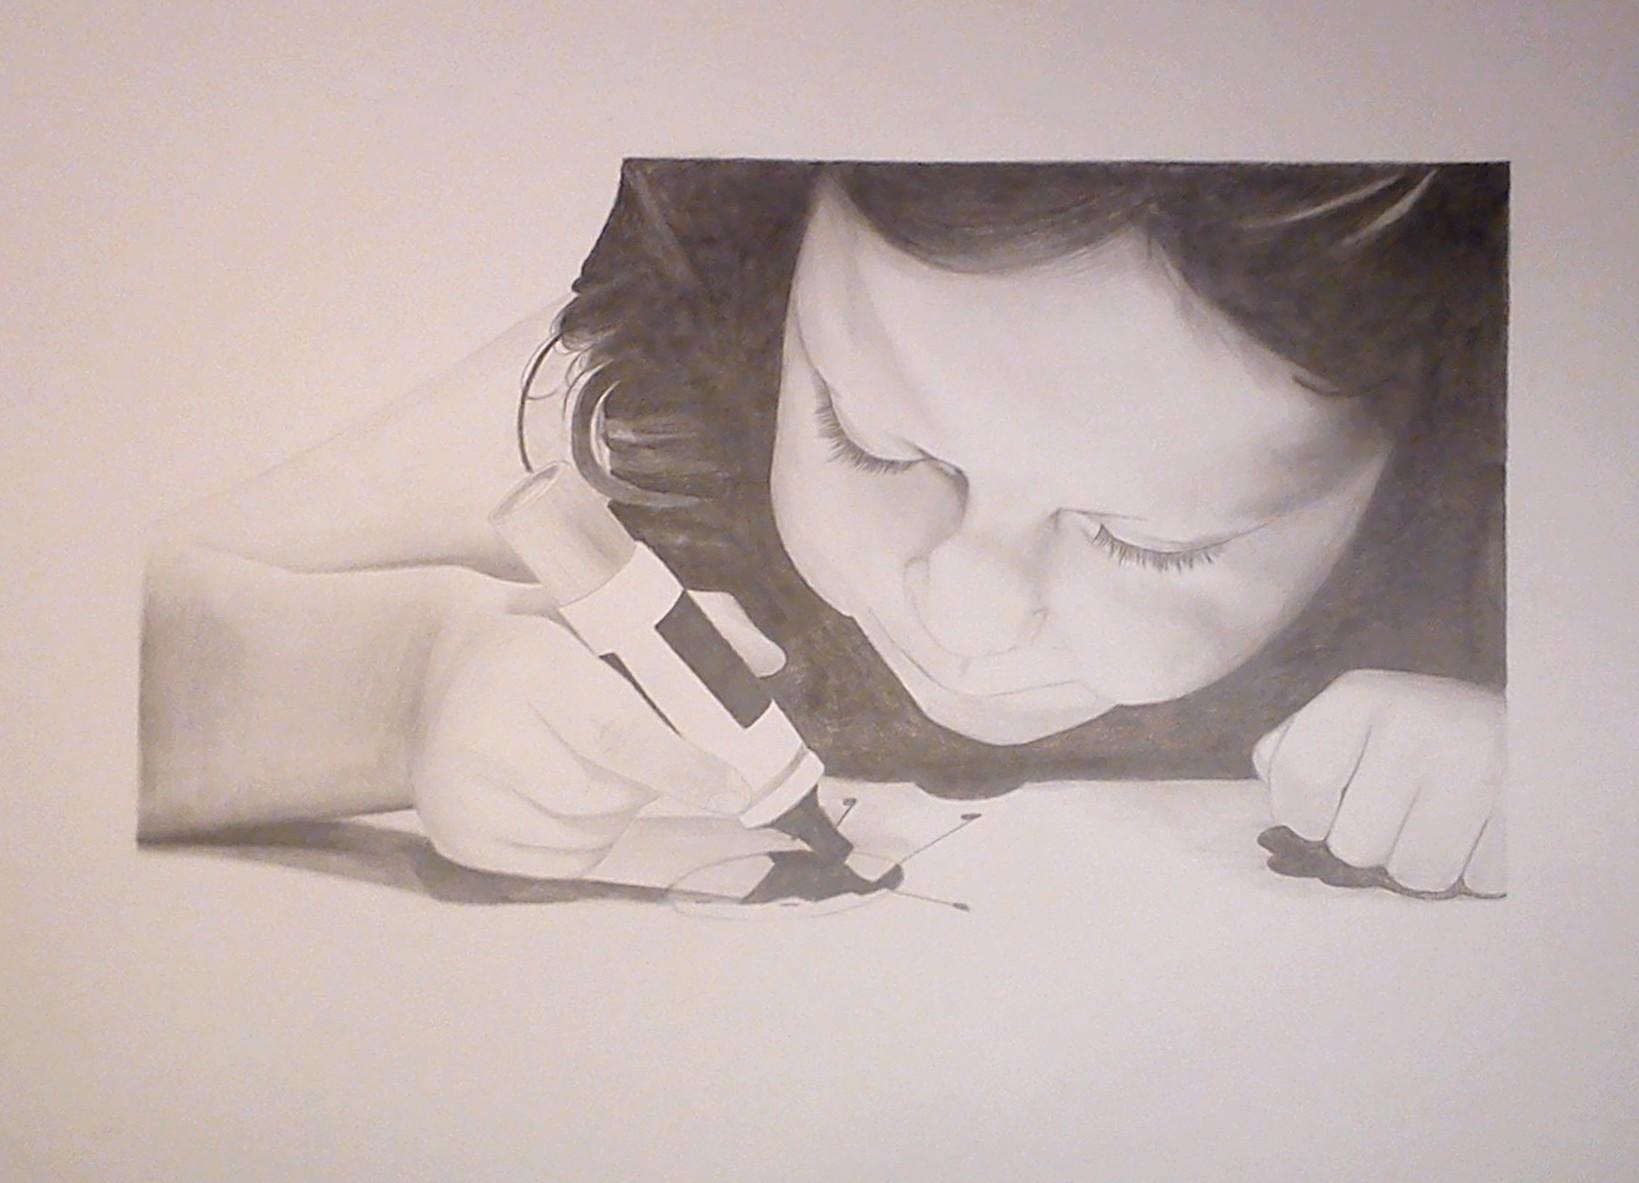 2011 - Yolaine - raisin - Crayon